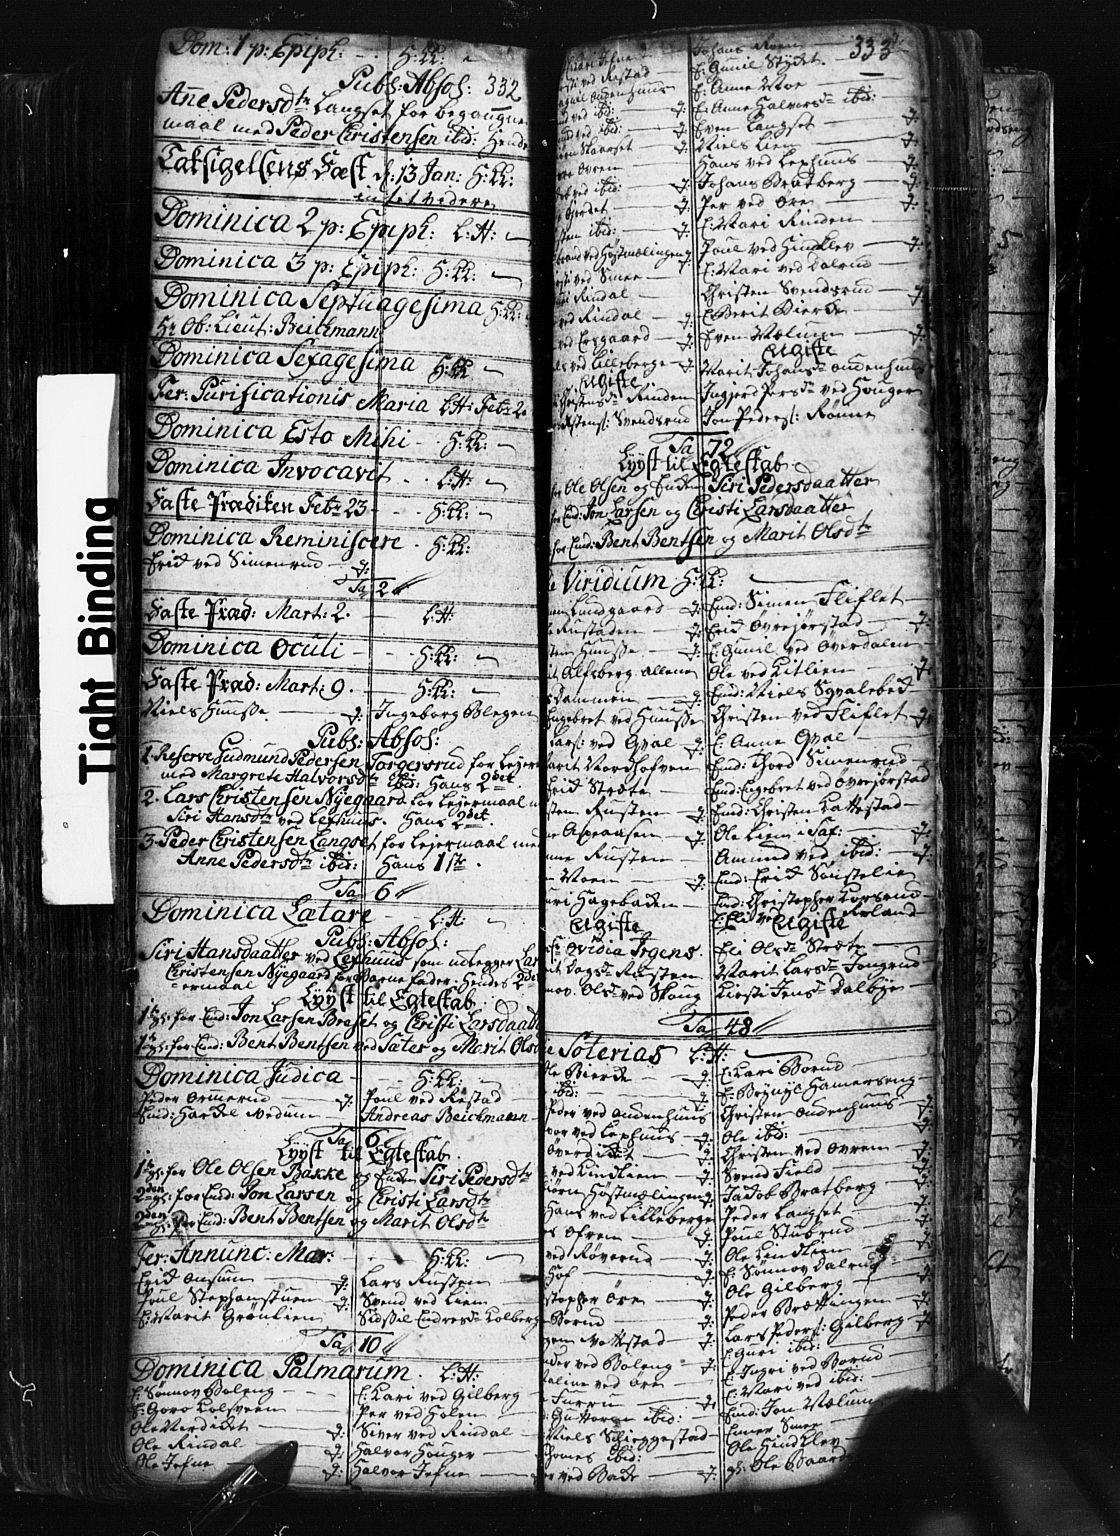 SAH, Fåberg prestekontor, Klokkerbok nr. 1, 1727-1767, s. 332-333